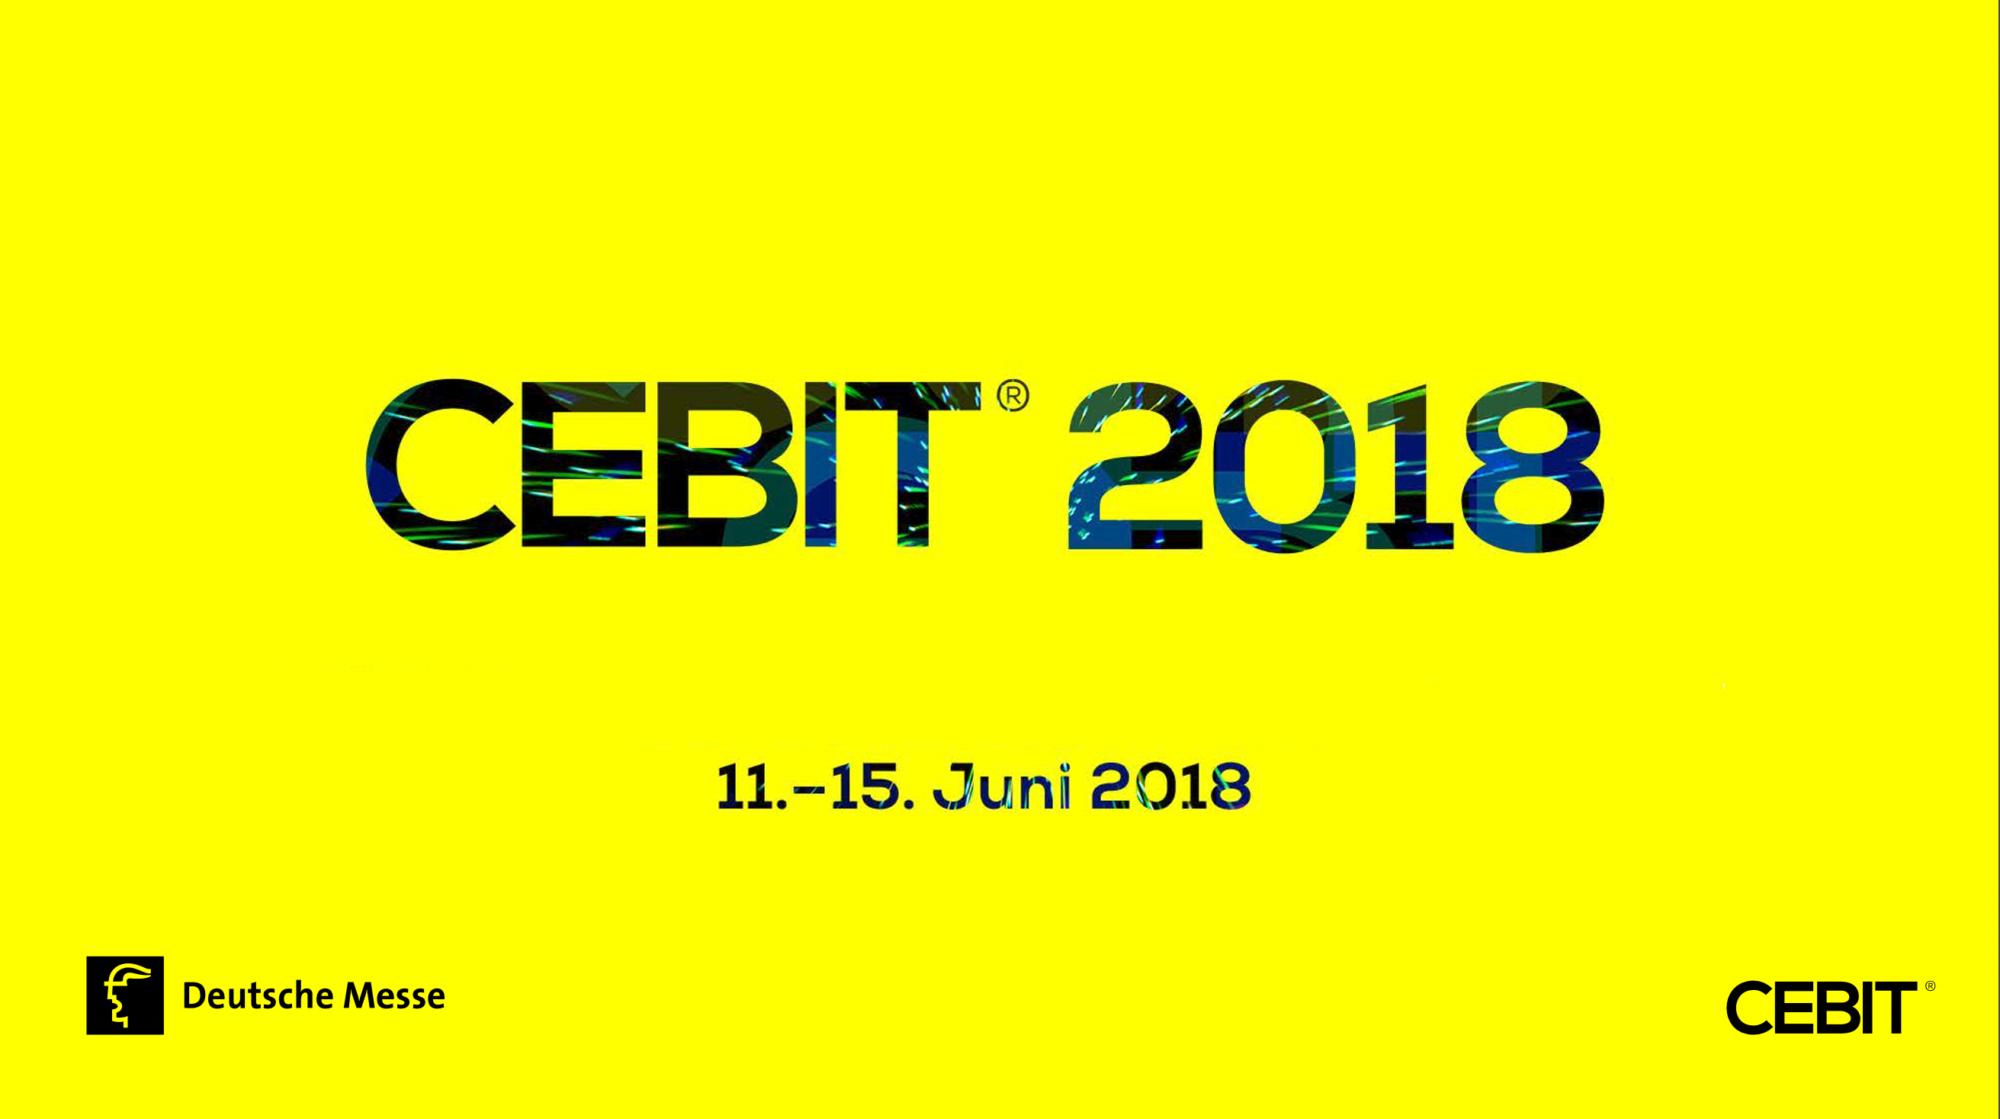 AMAGNO ON CEBIT 2018 e1504600042192 - Events